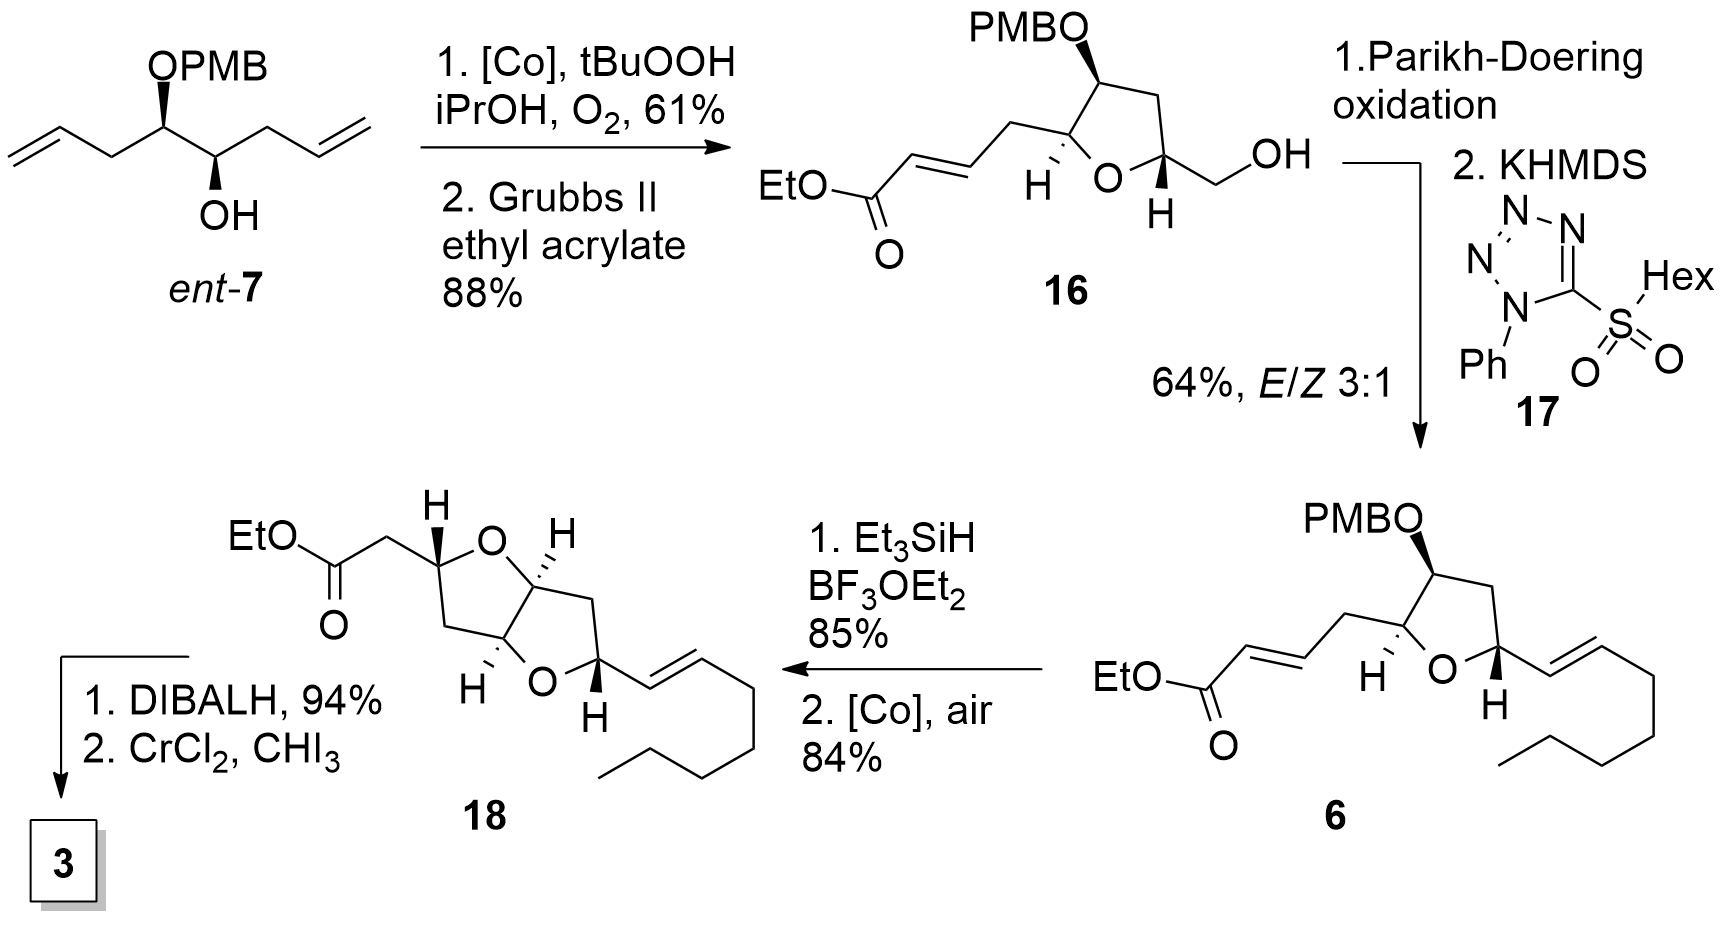 amphirionin2-3.png